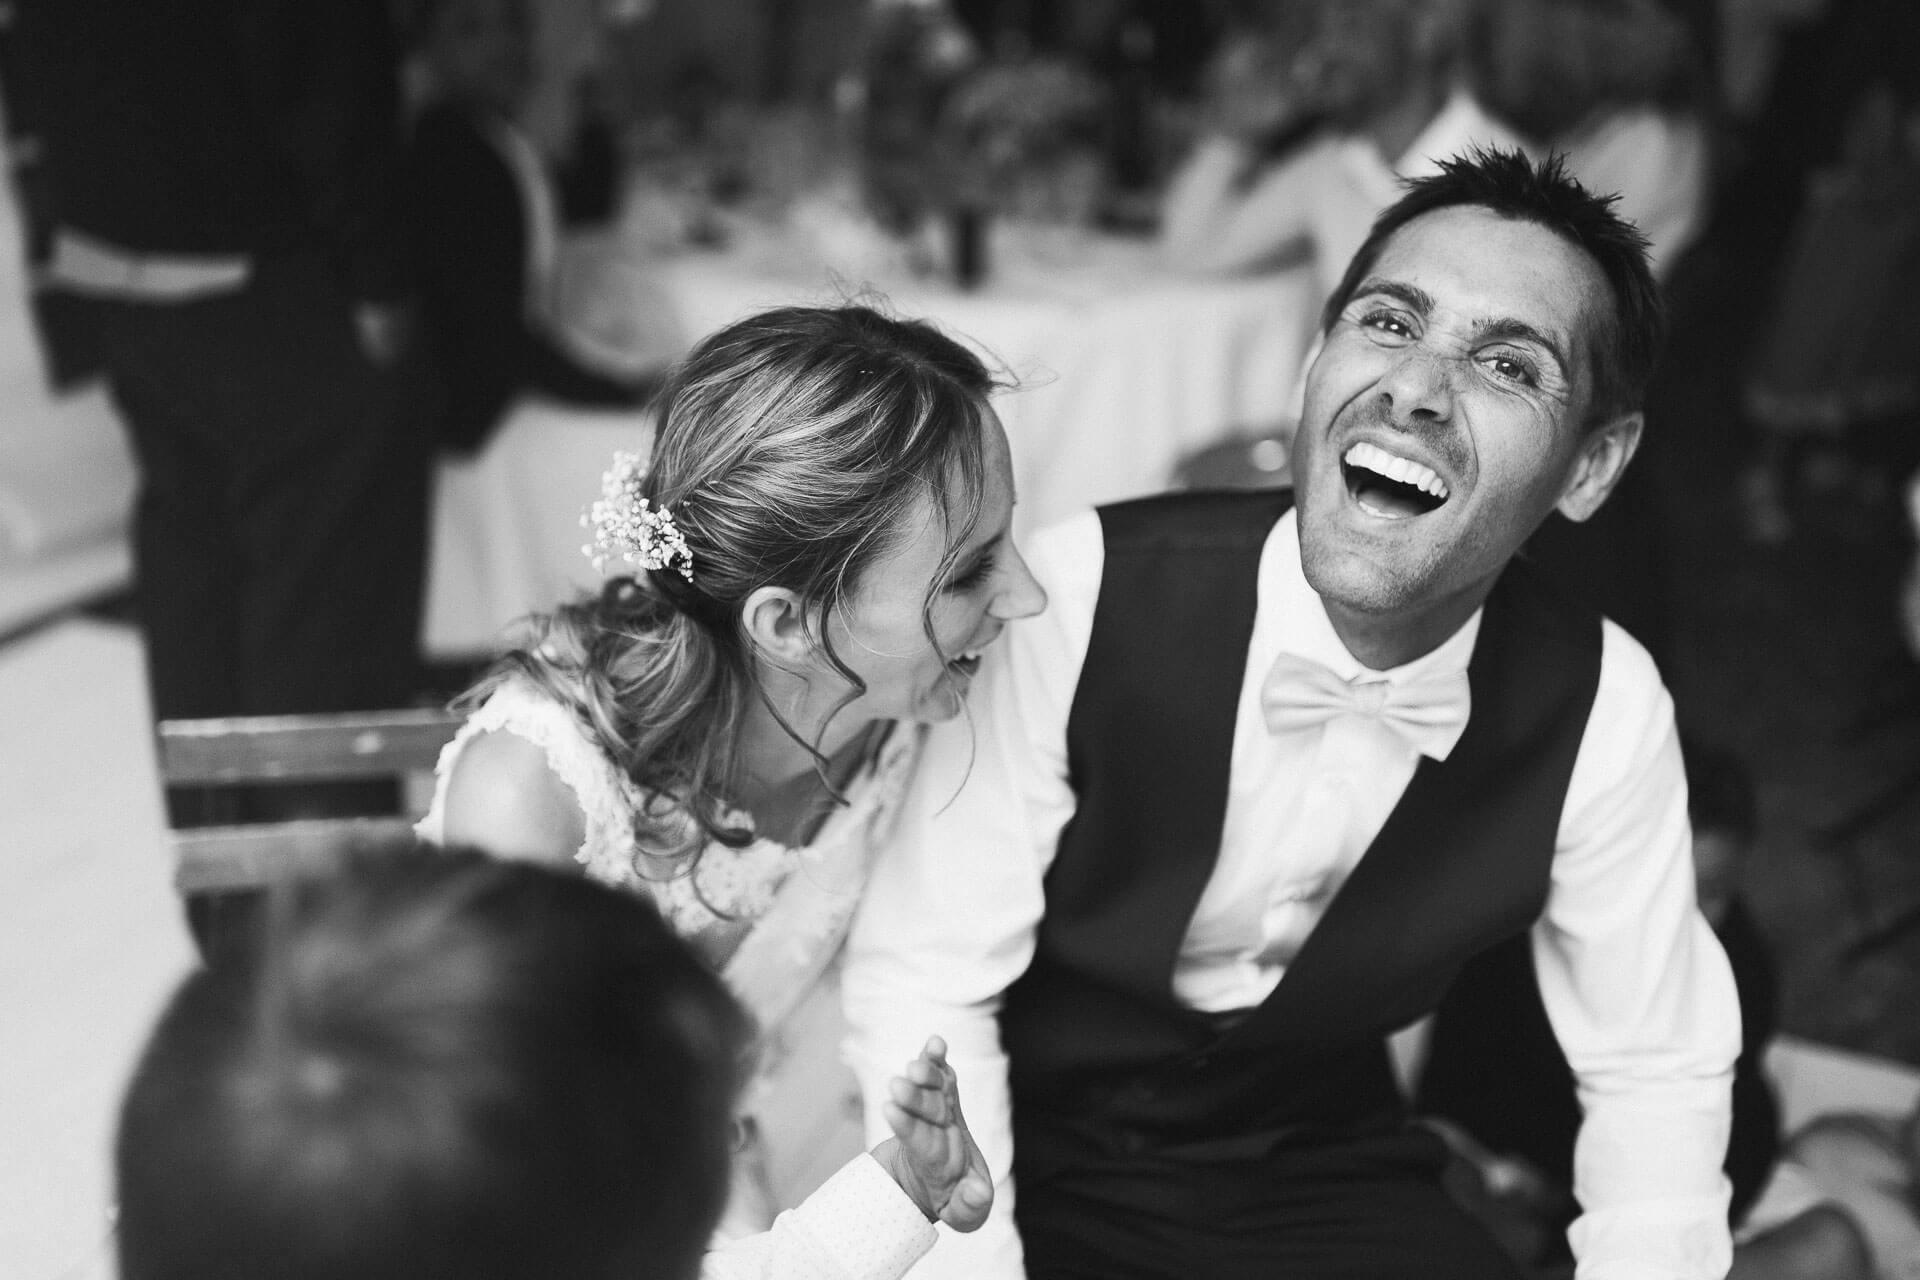 photographe-mariage-aix-en-provence-stephanie-jerome-34